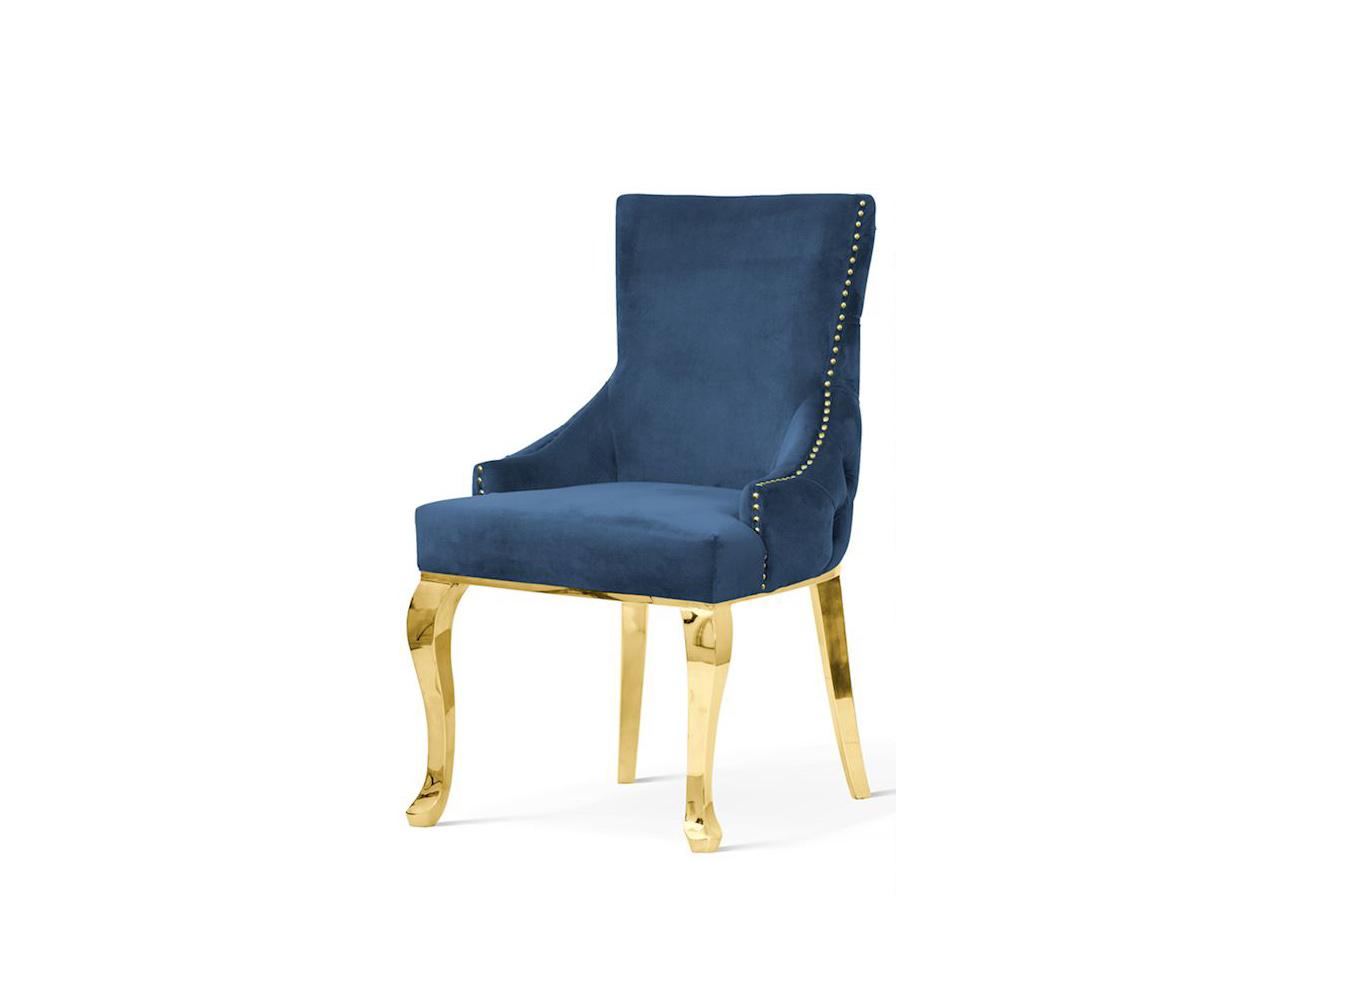 Polsterstuhl Chesterfield Edward Glamour → Onlineshop Sofa & Bett